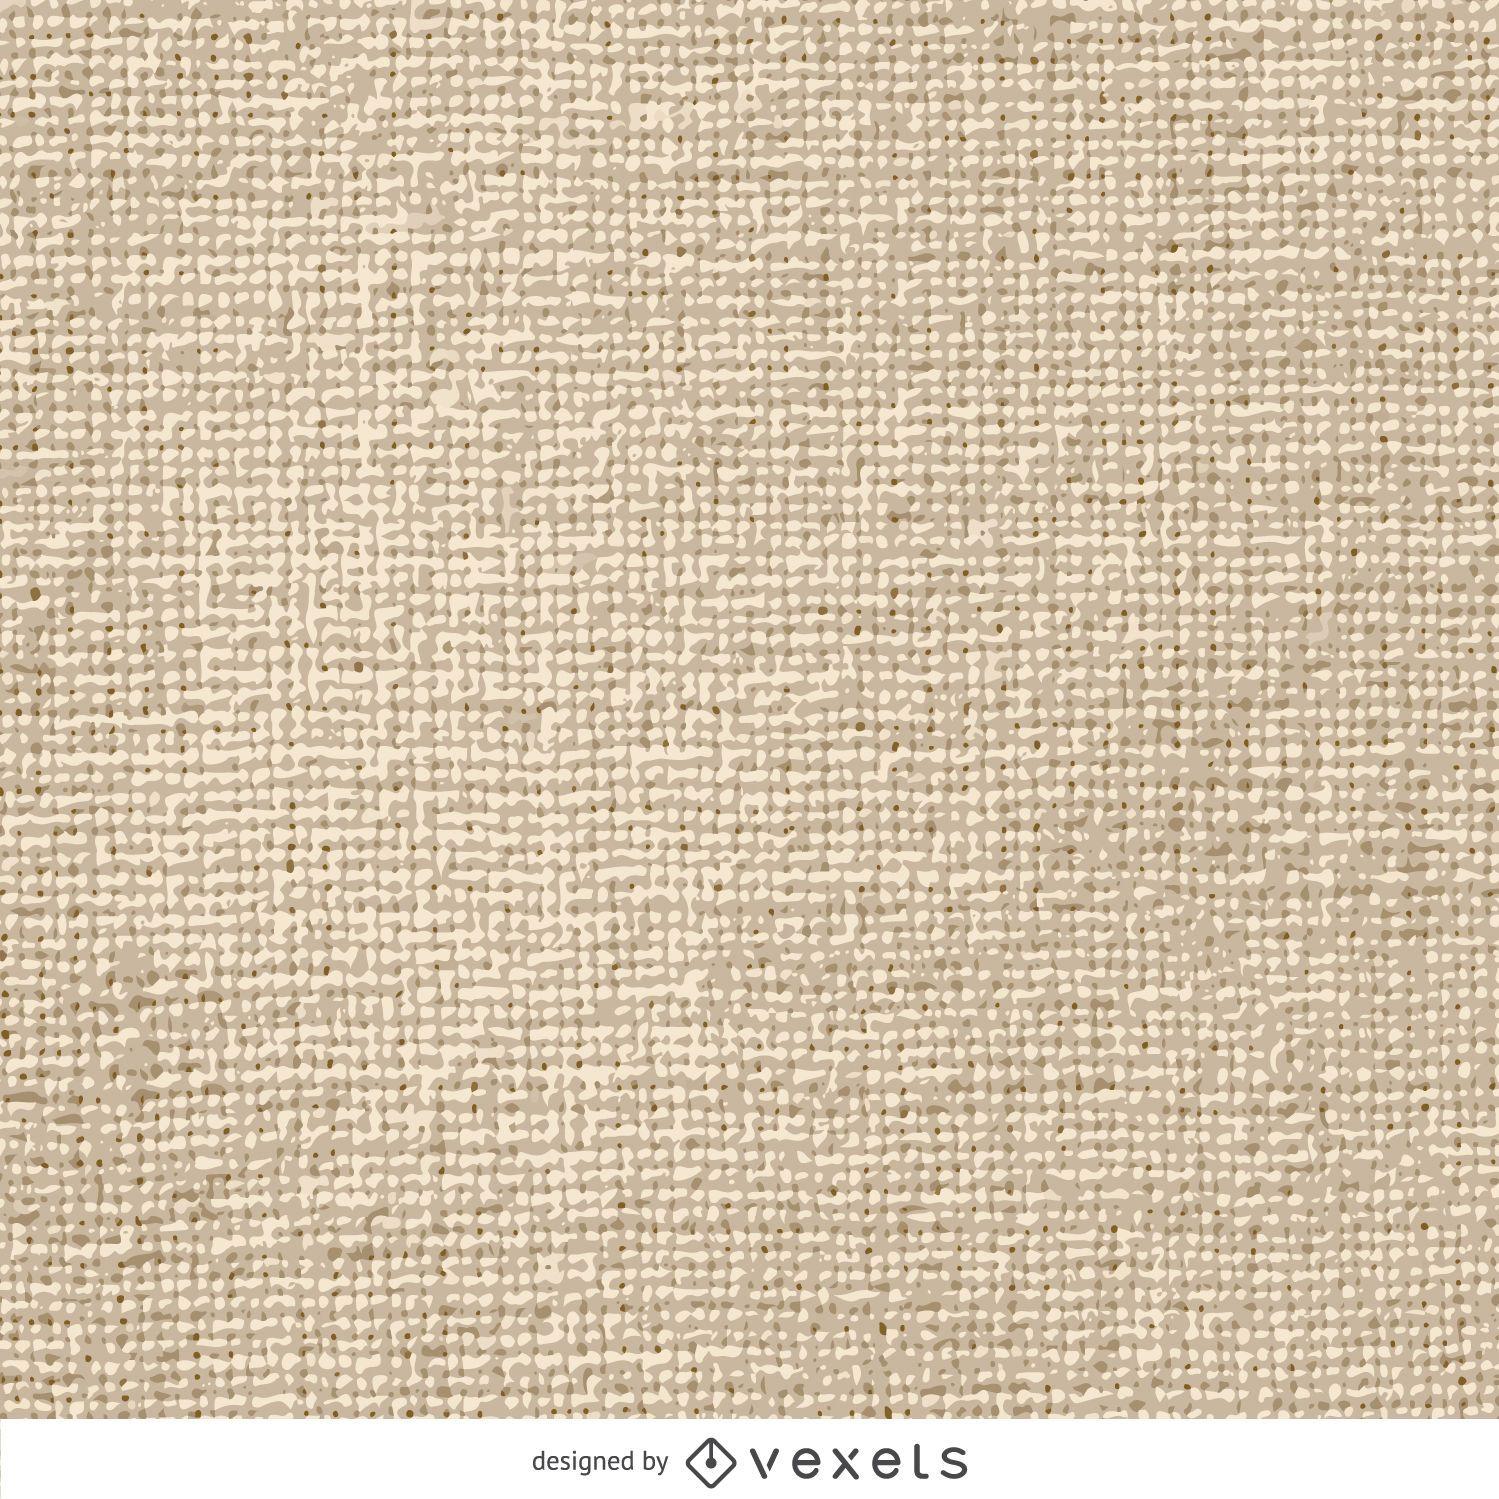 Fabric Canvas Texture Vector Download